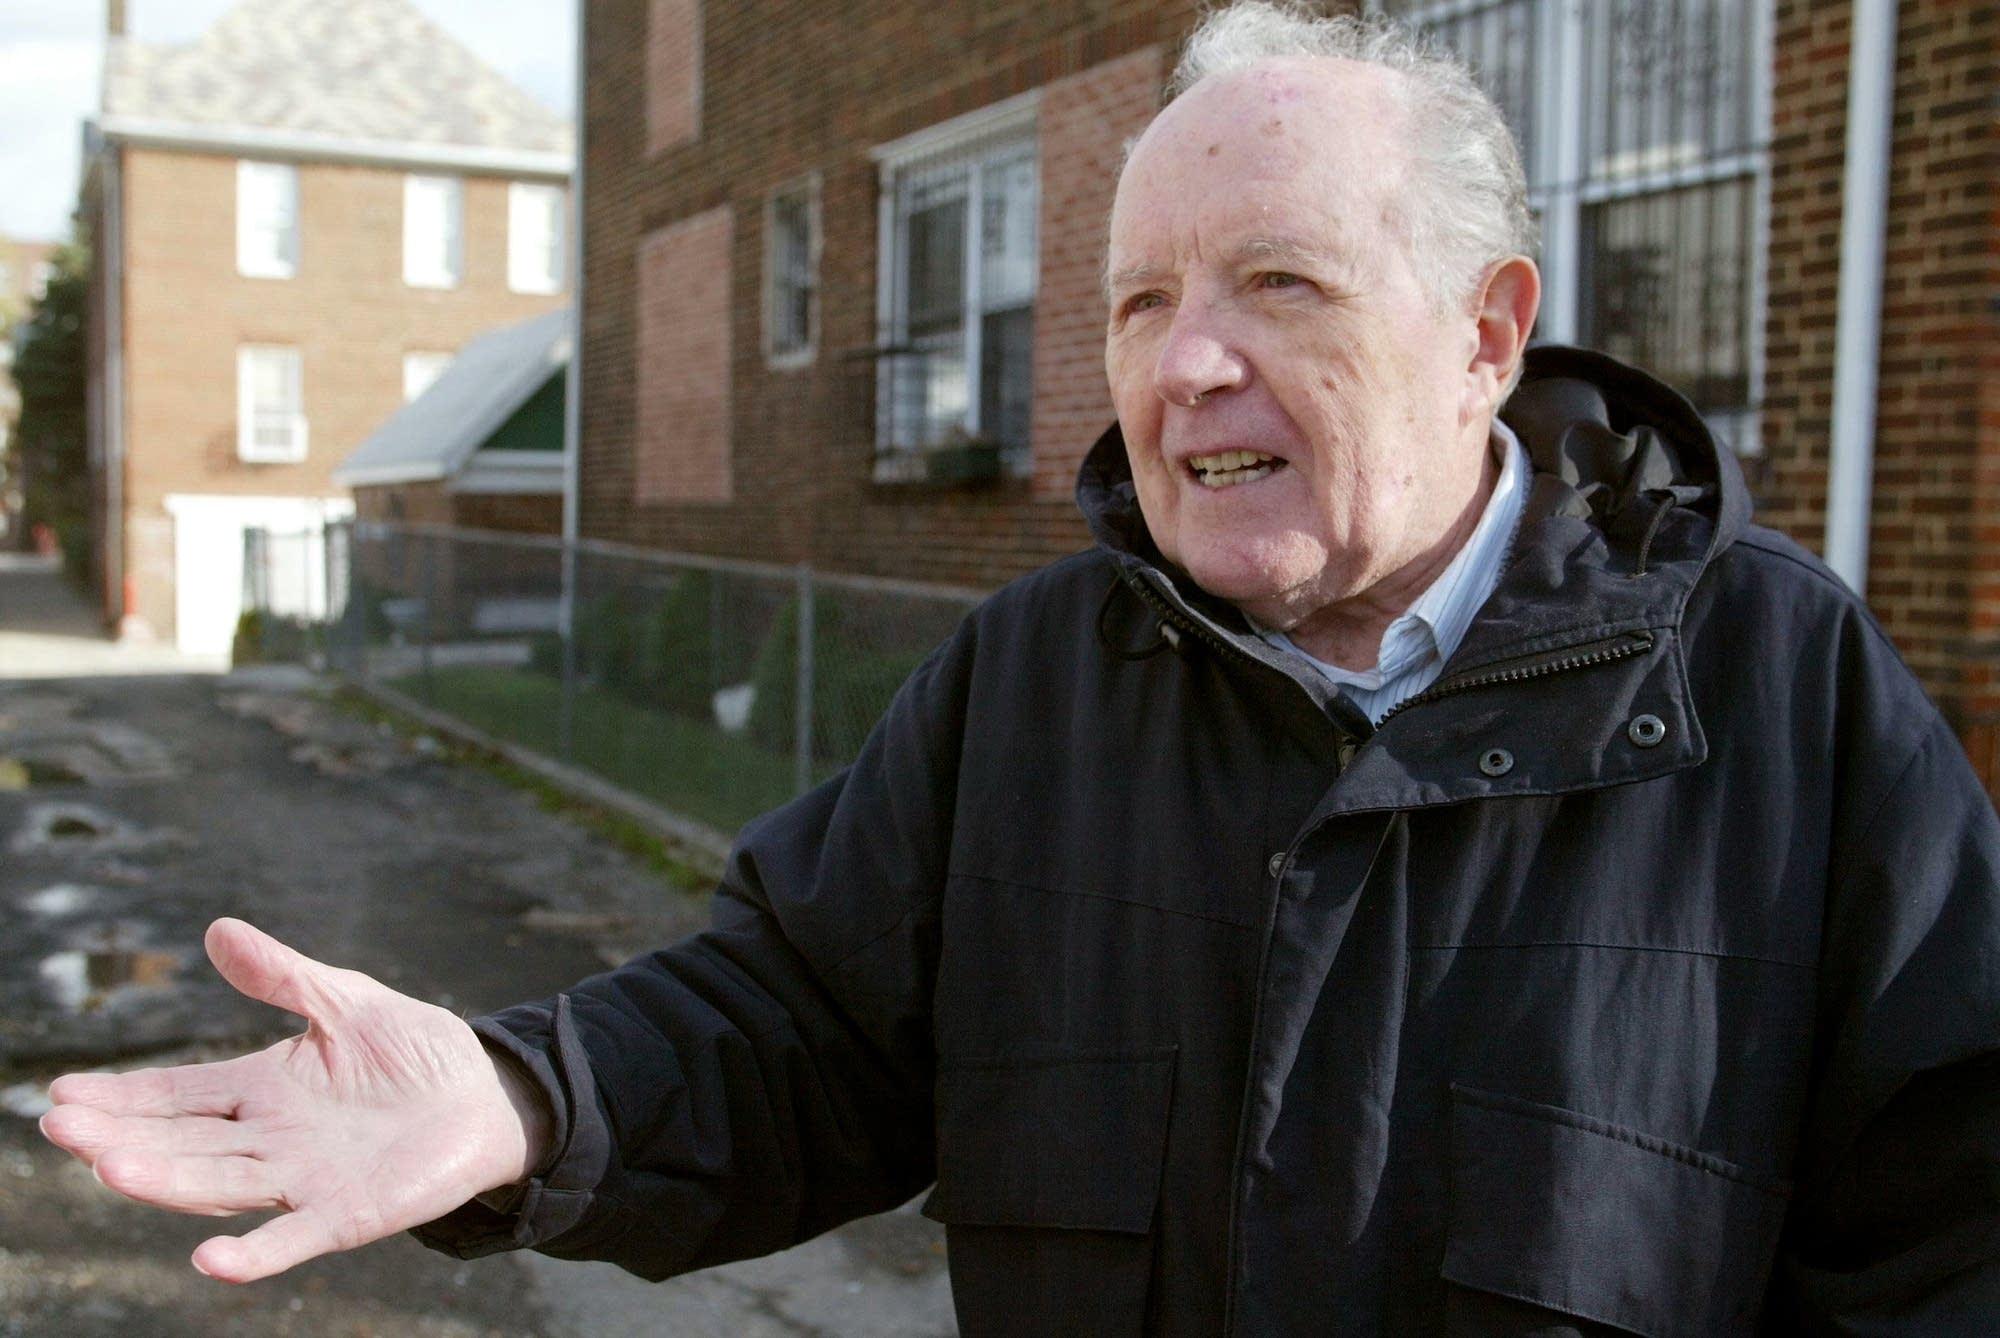 U.S. deports former Nazi camp guard, 95, to Germany   MPR News